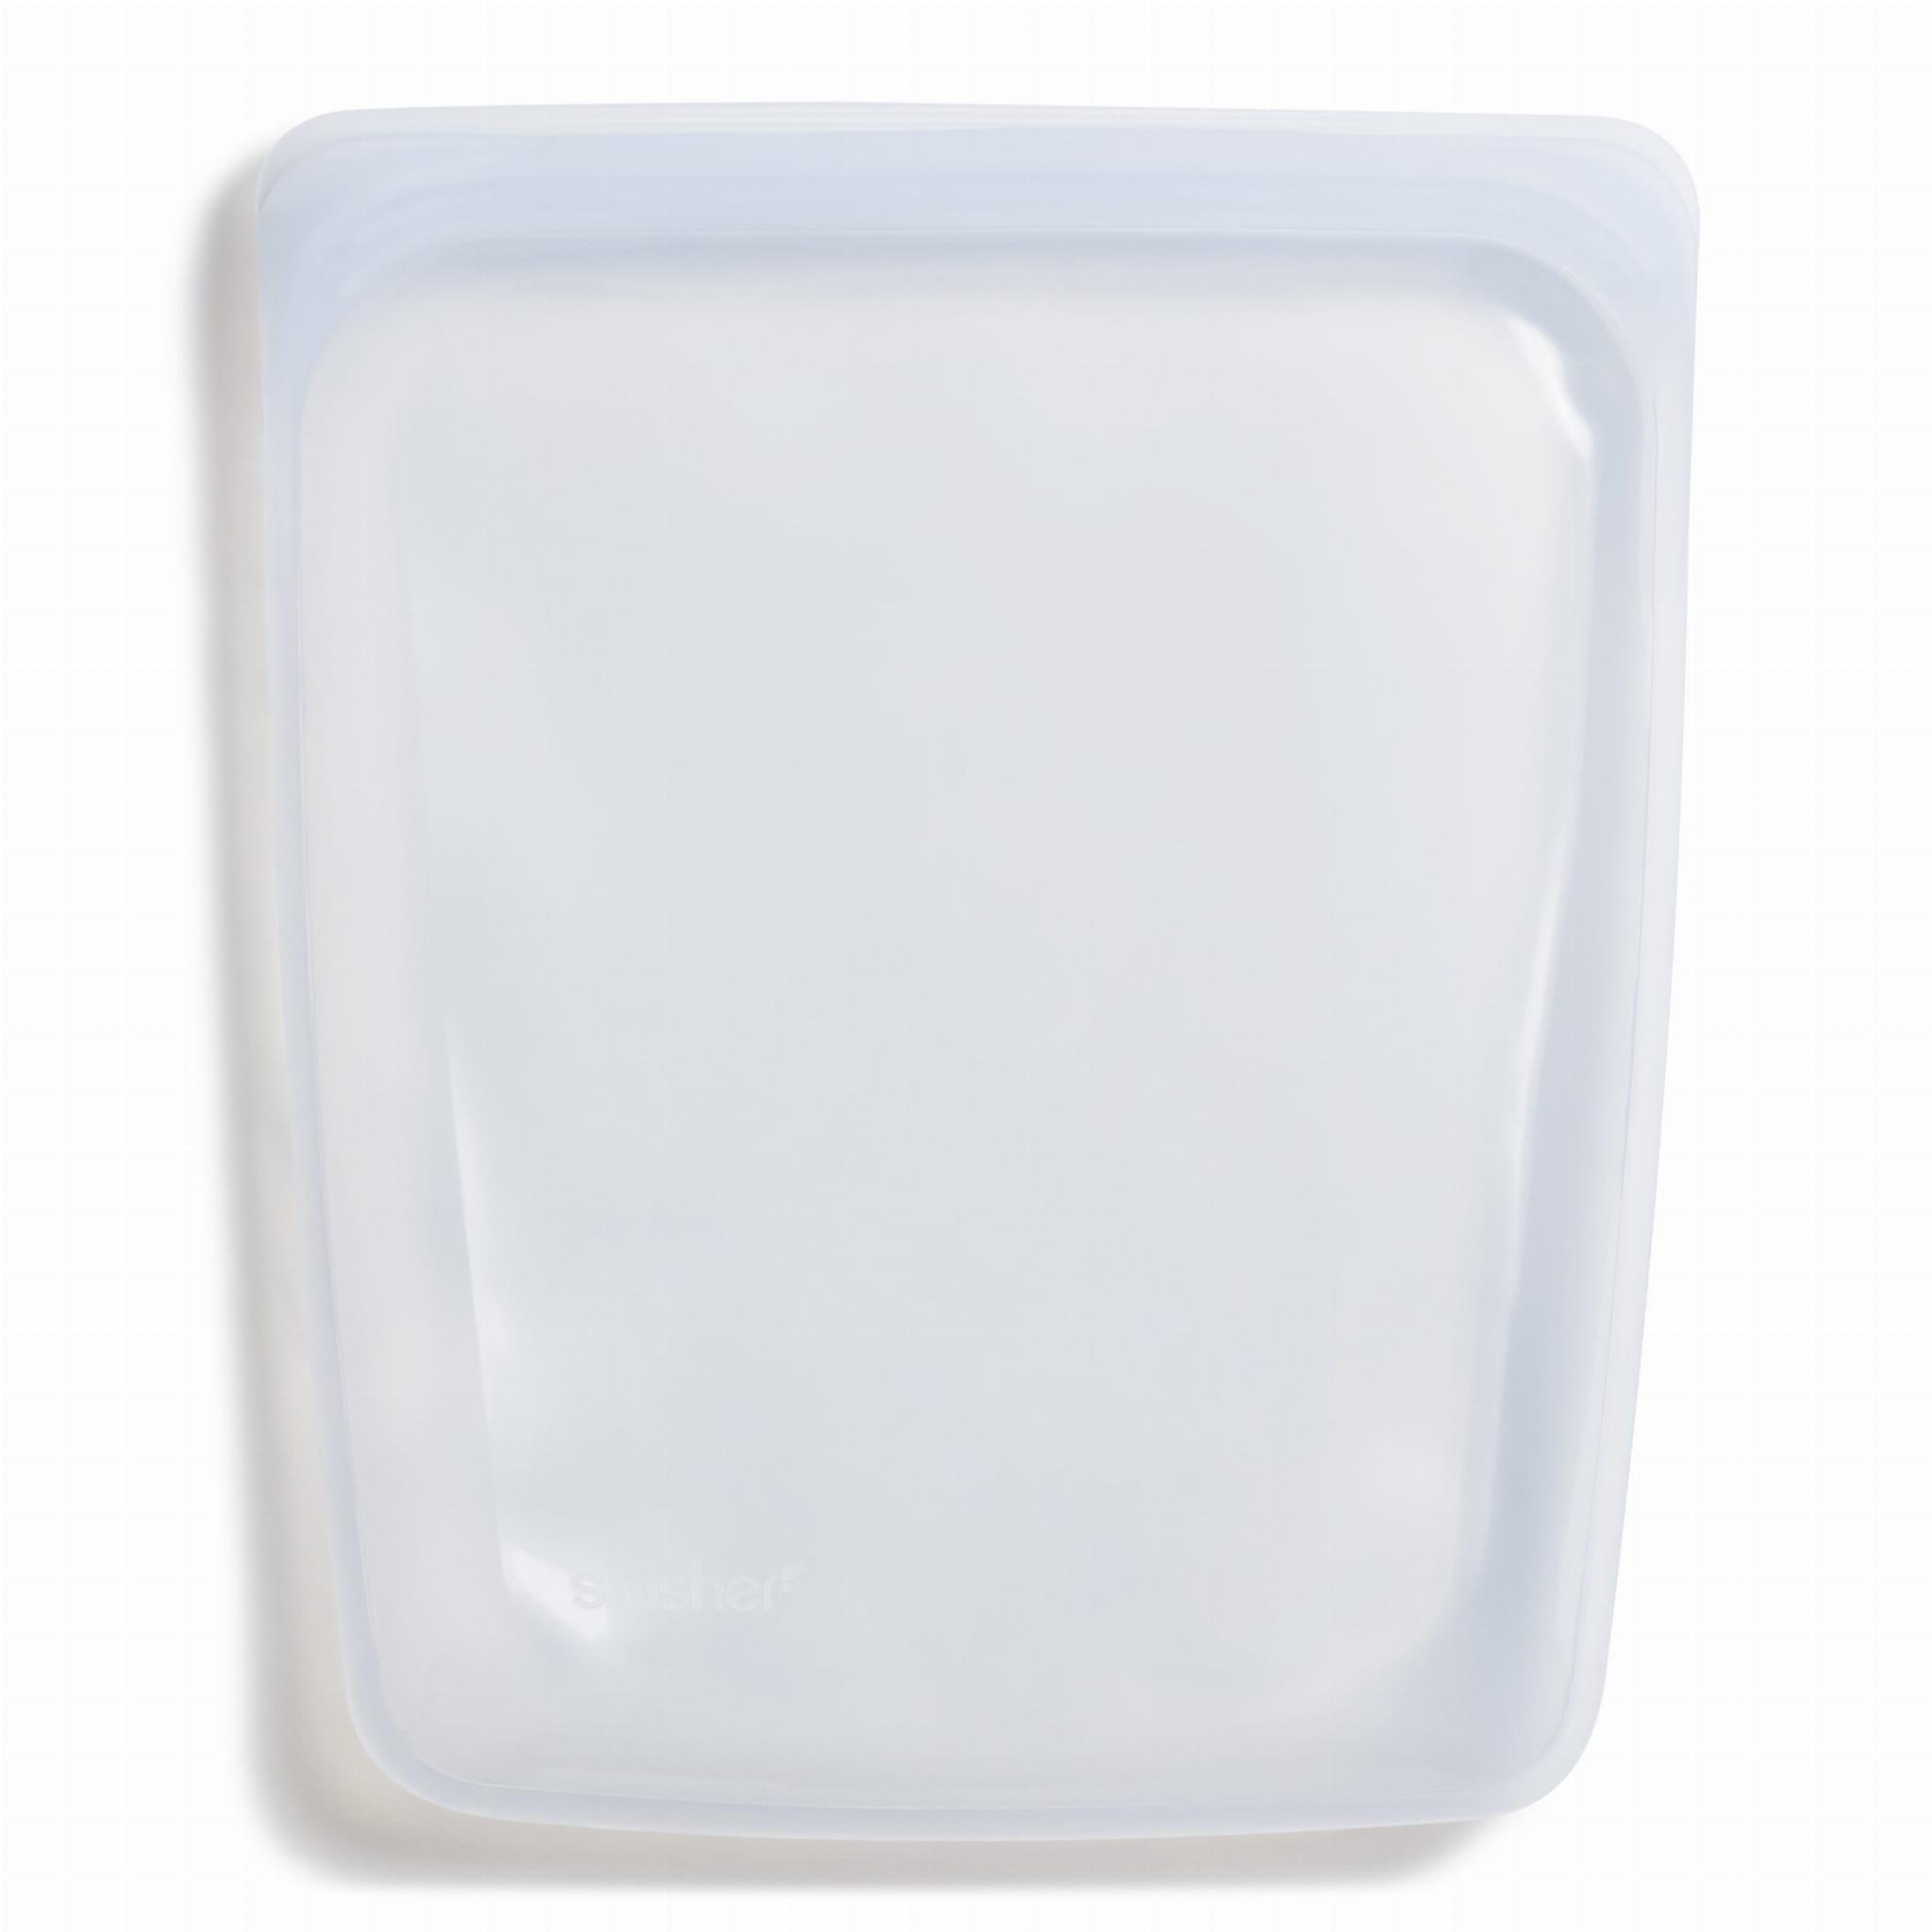 STASHER Half-Gallon Wielorazowa torebka silikonowa | SoBio Beauty Boutique